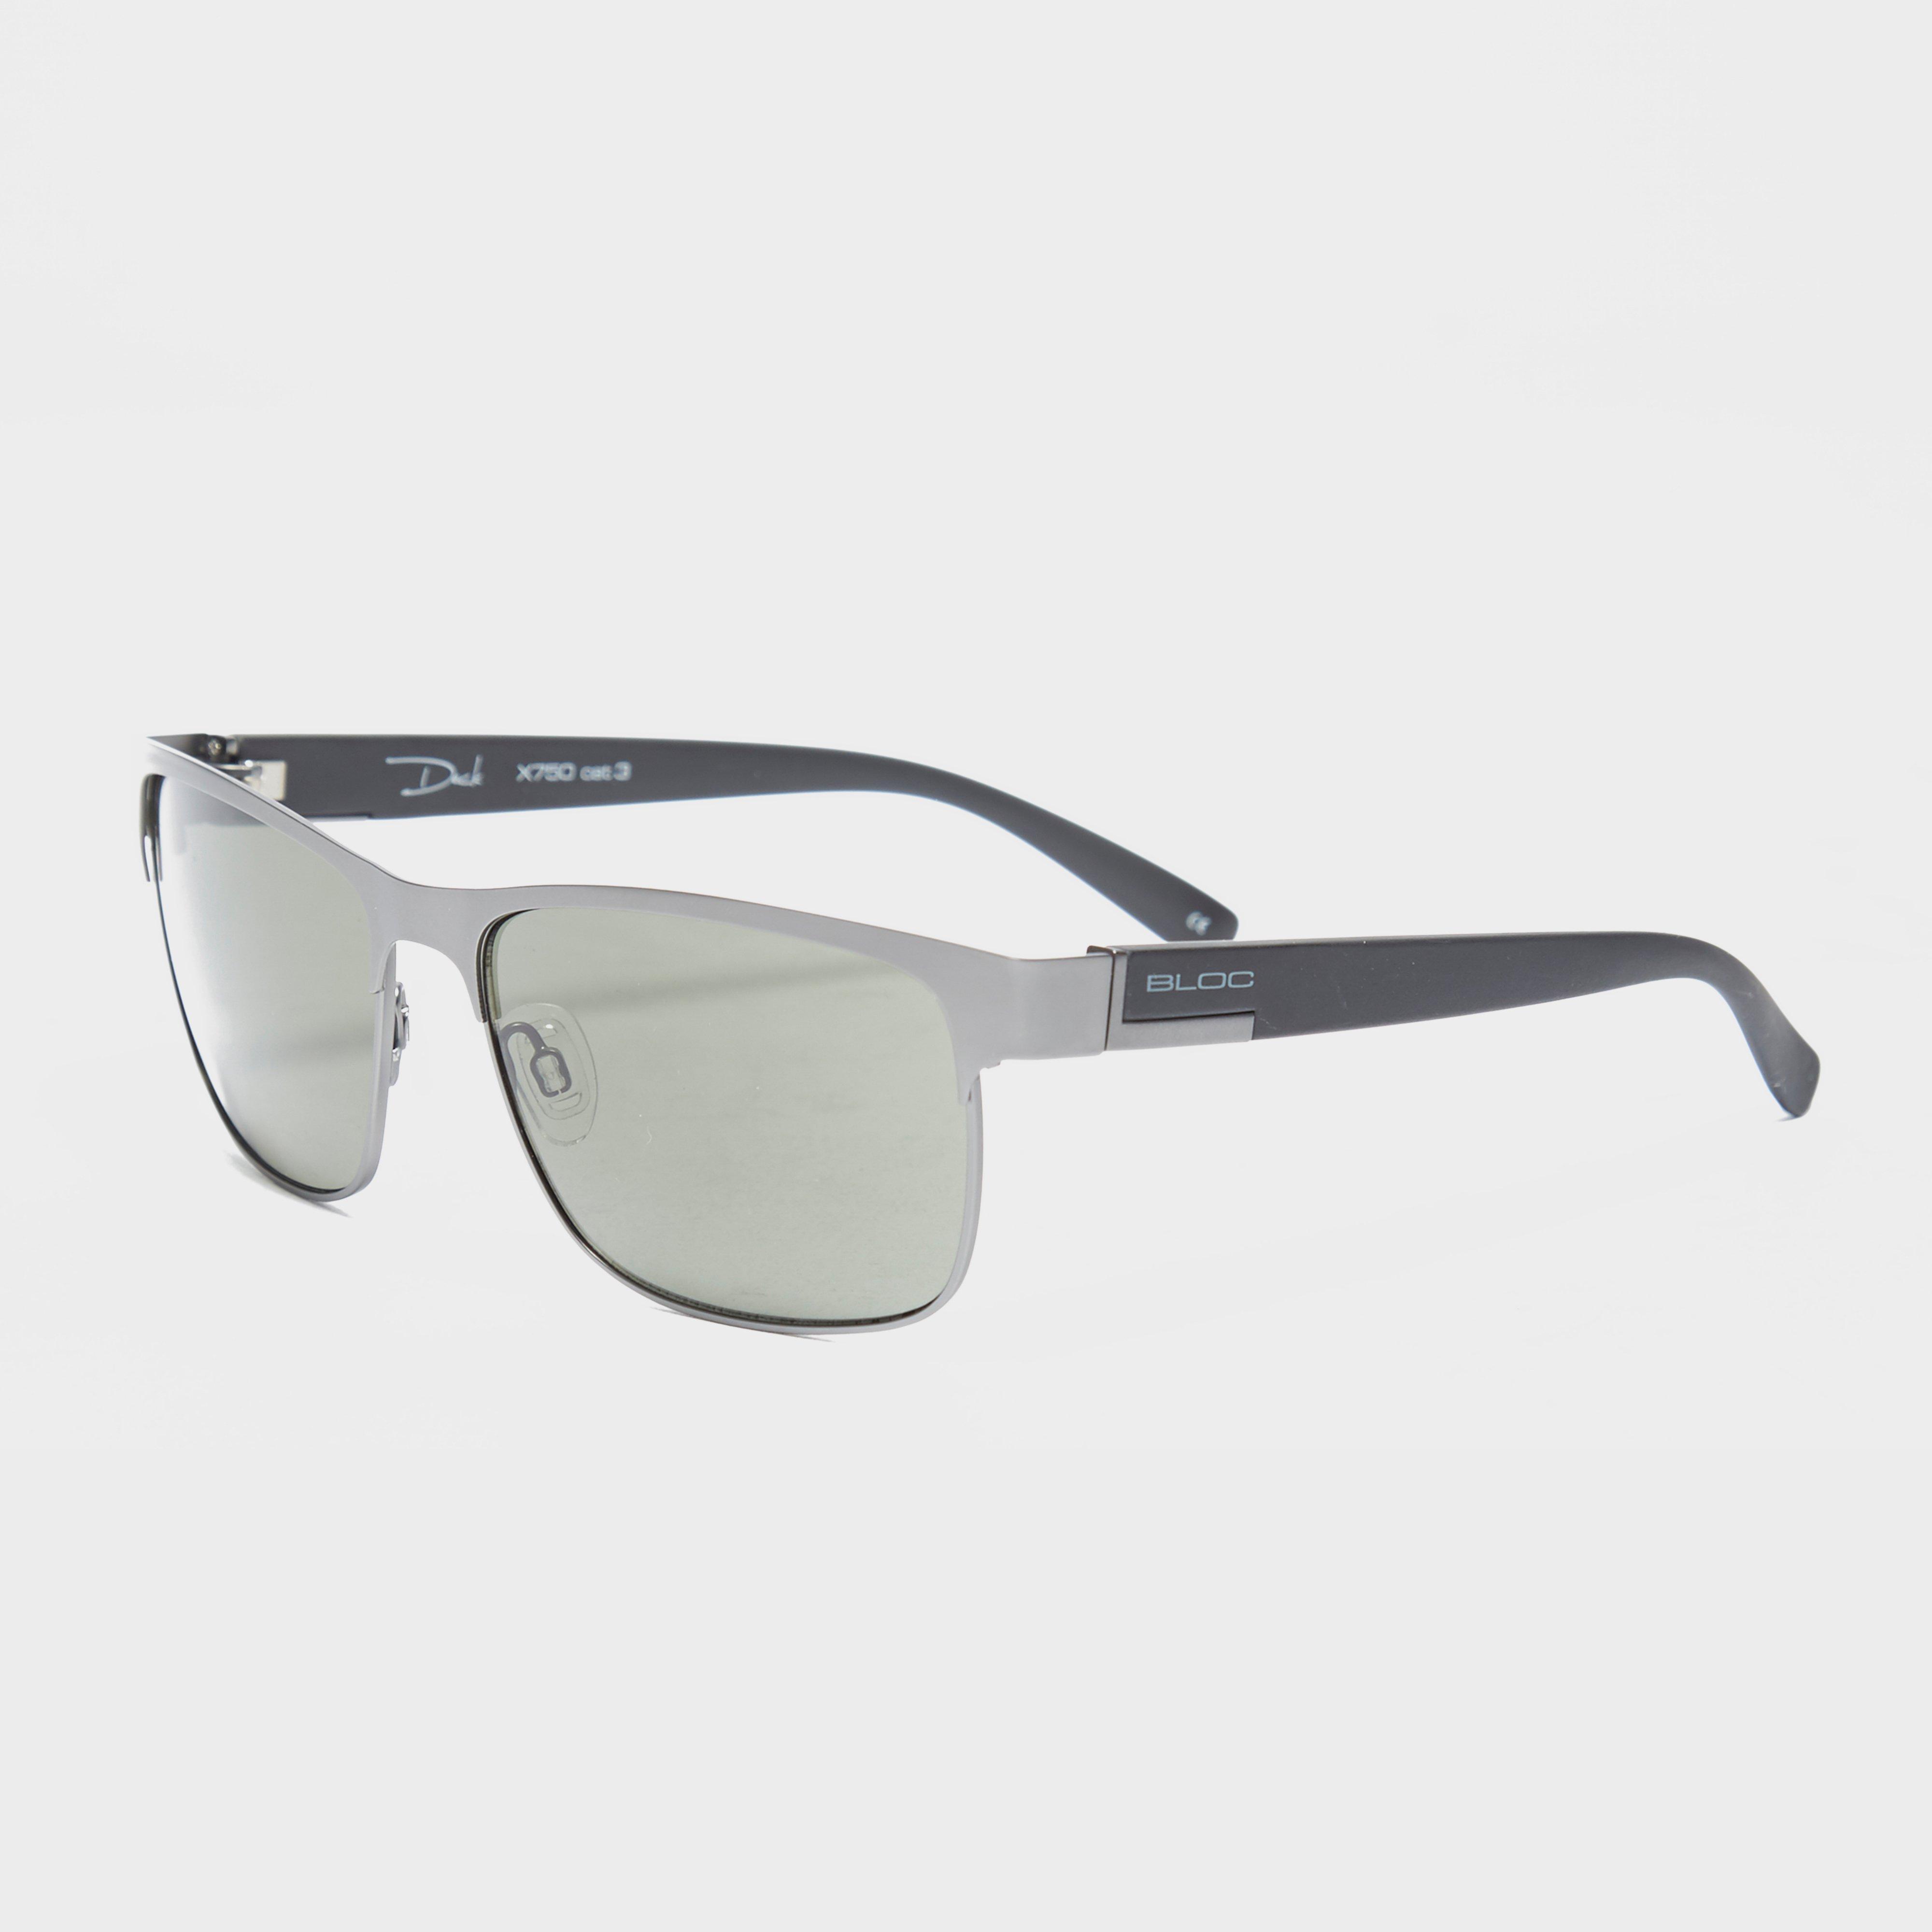 Bloc Deck X750 Sunglasses - Black/blk/gry  Black/blk/gry